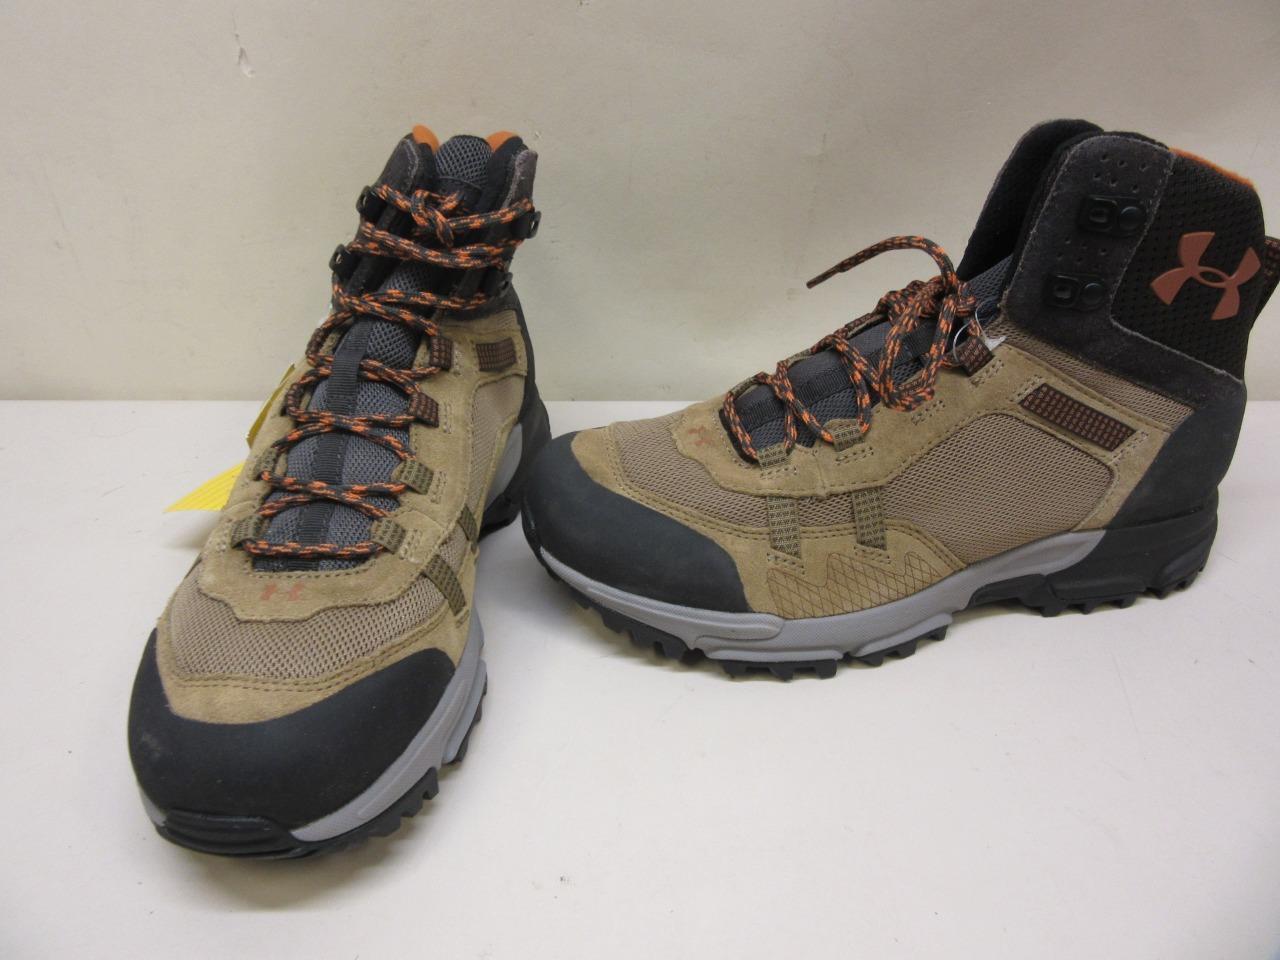 Under Armour Glenrock Mid 2.0 Hiking Shoes SMS Sample Men's size 9 Tan/Black